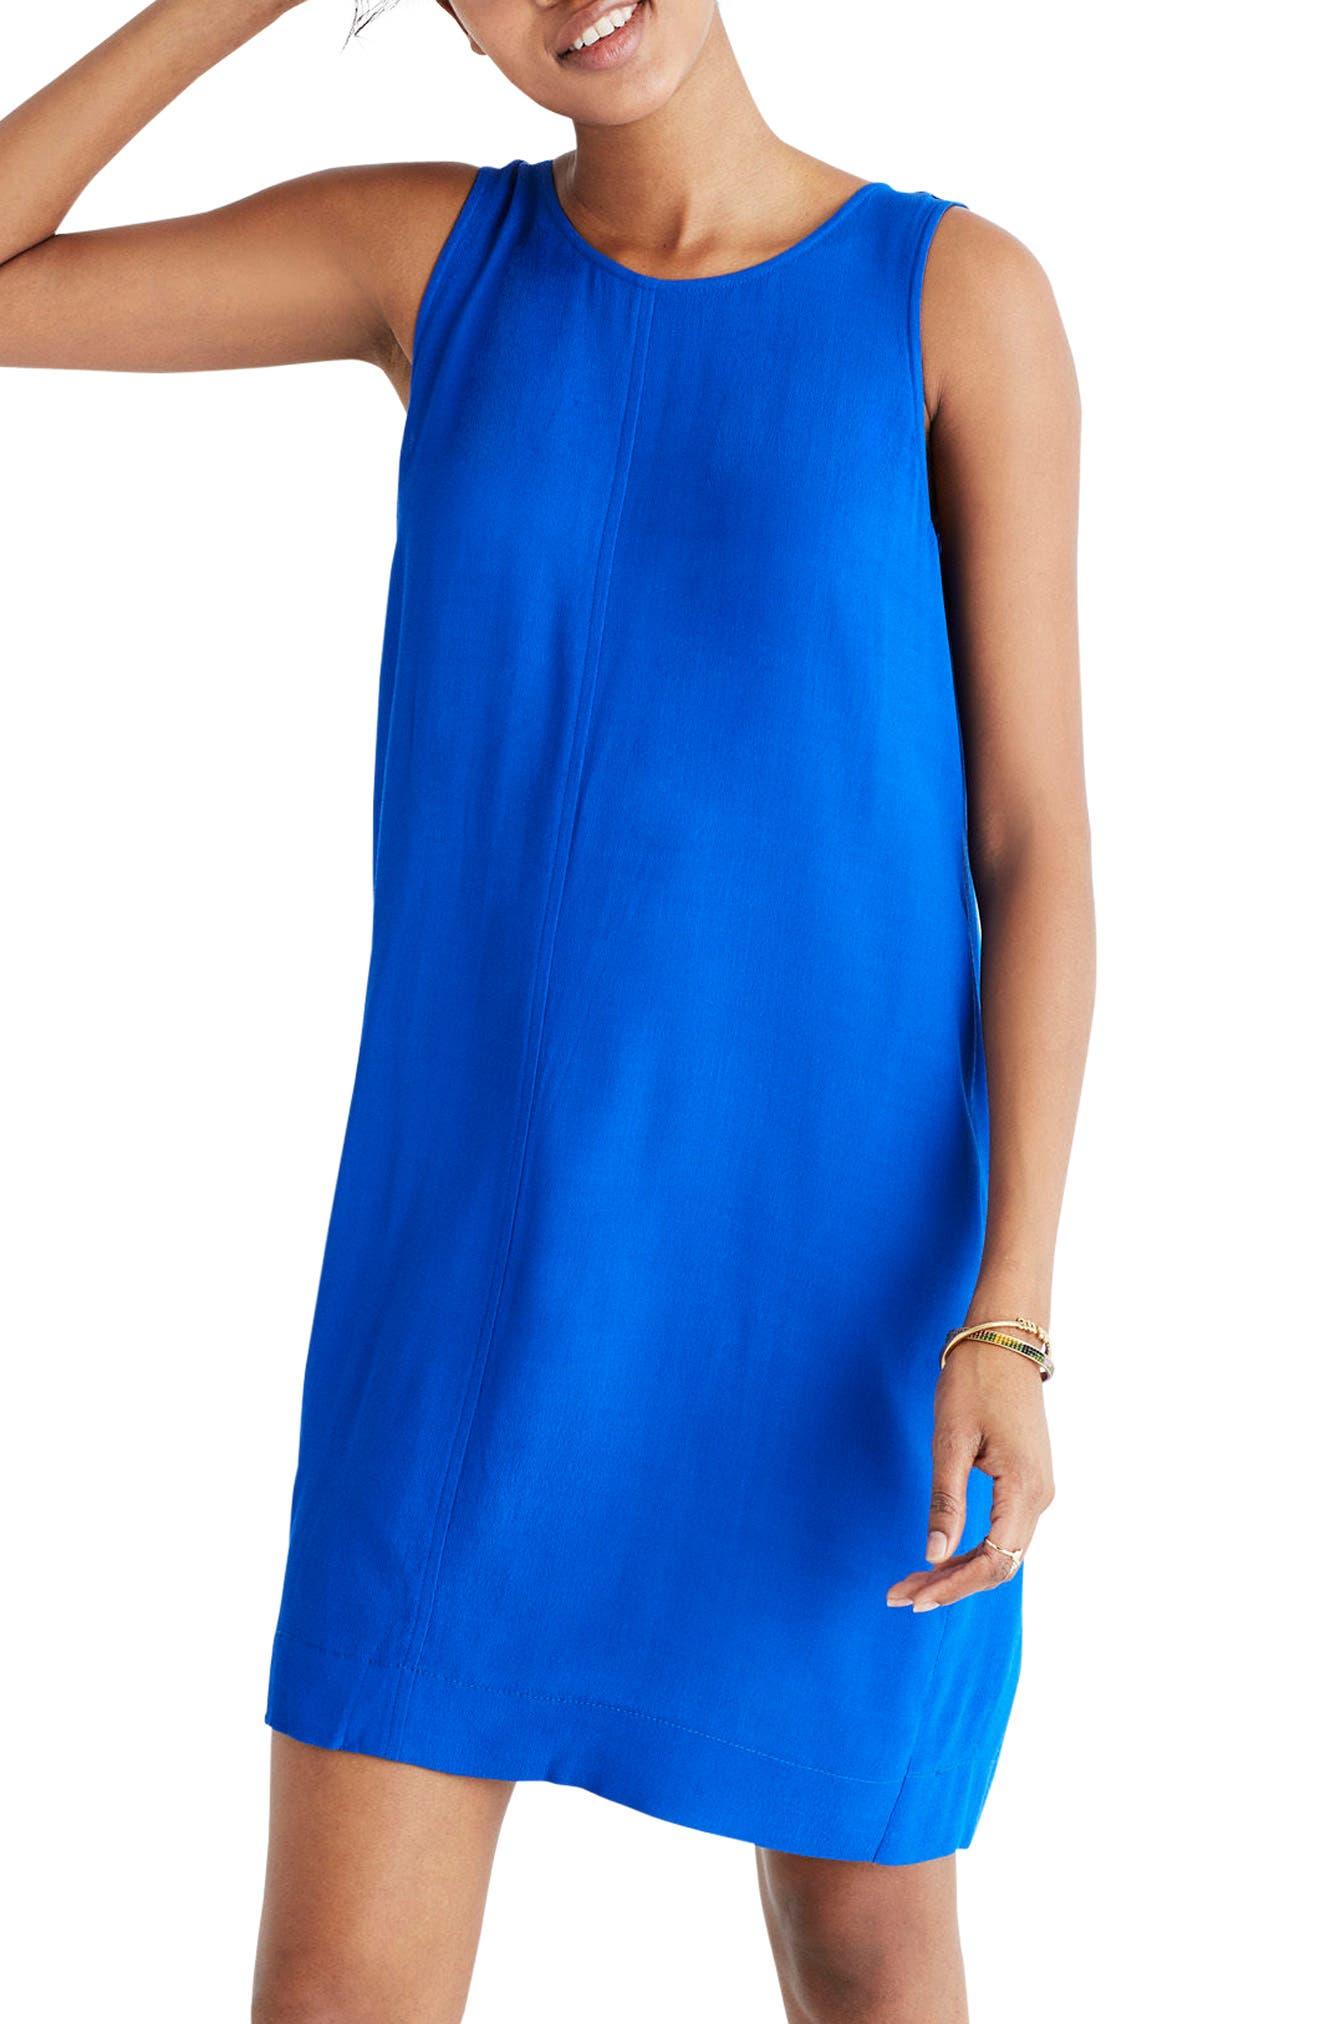 Lakeshore Button Back Dress,                         Main,                         color, Brilliant Royal